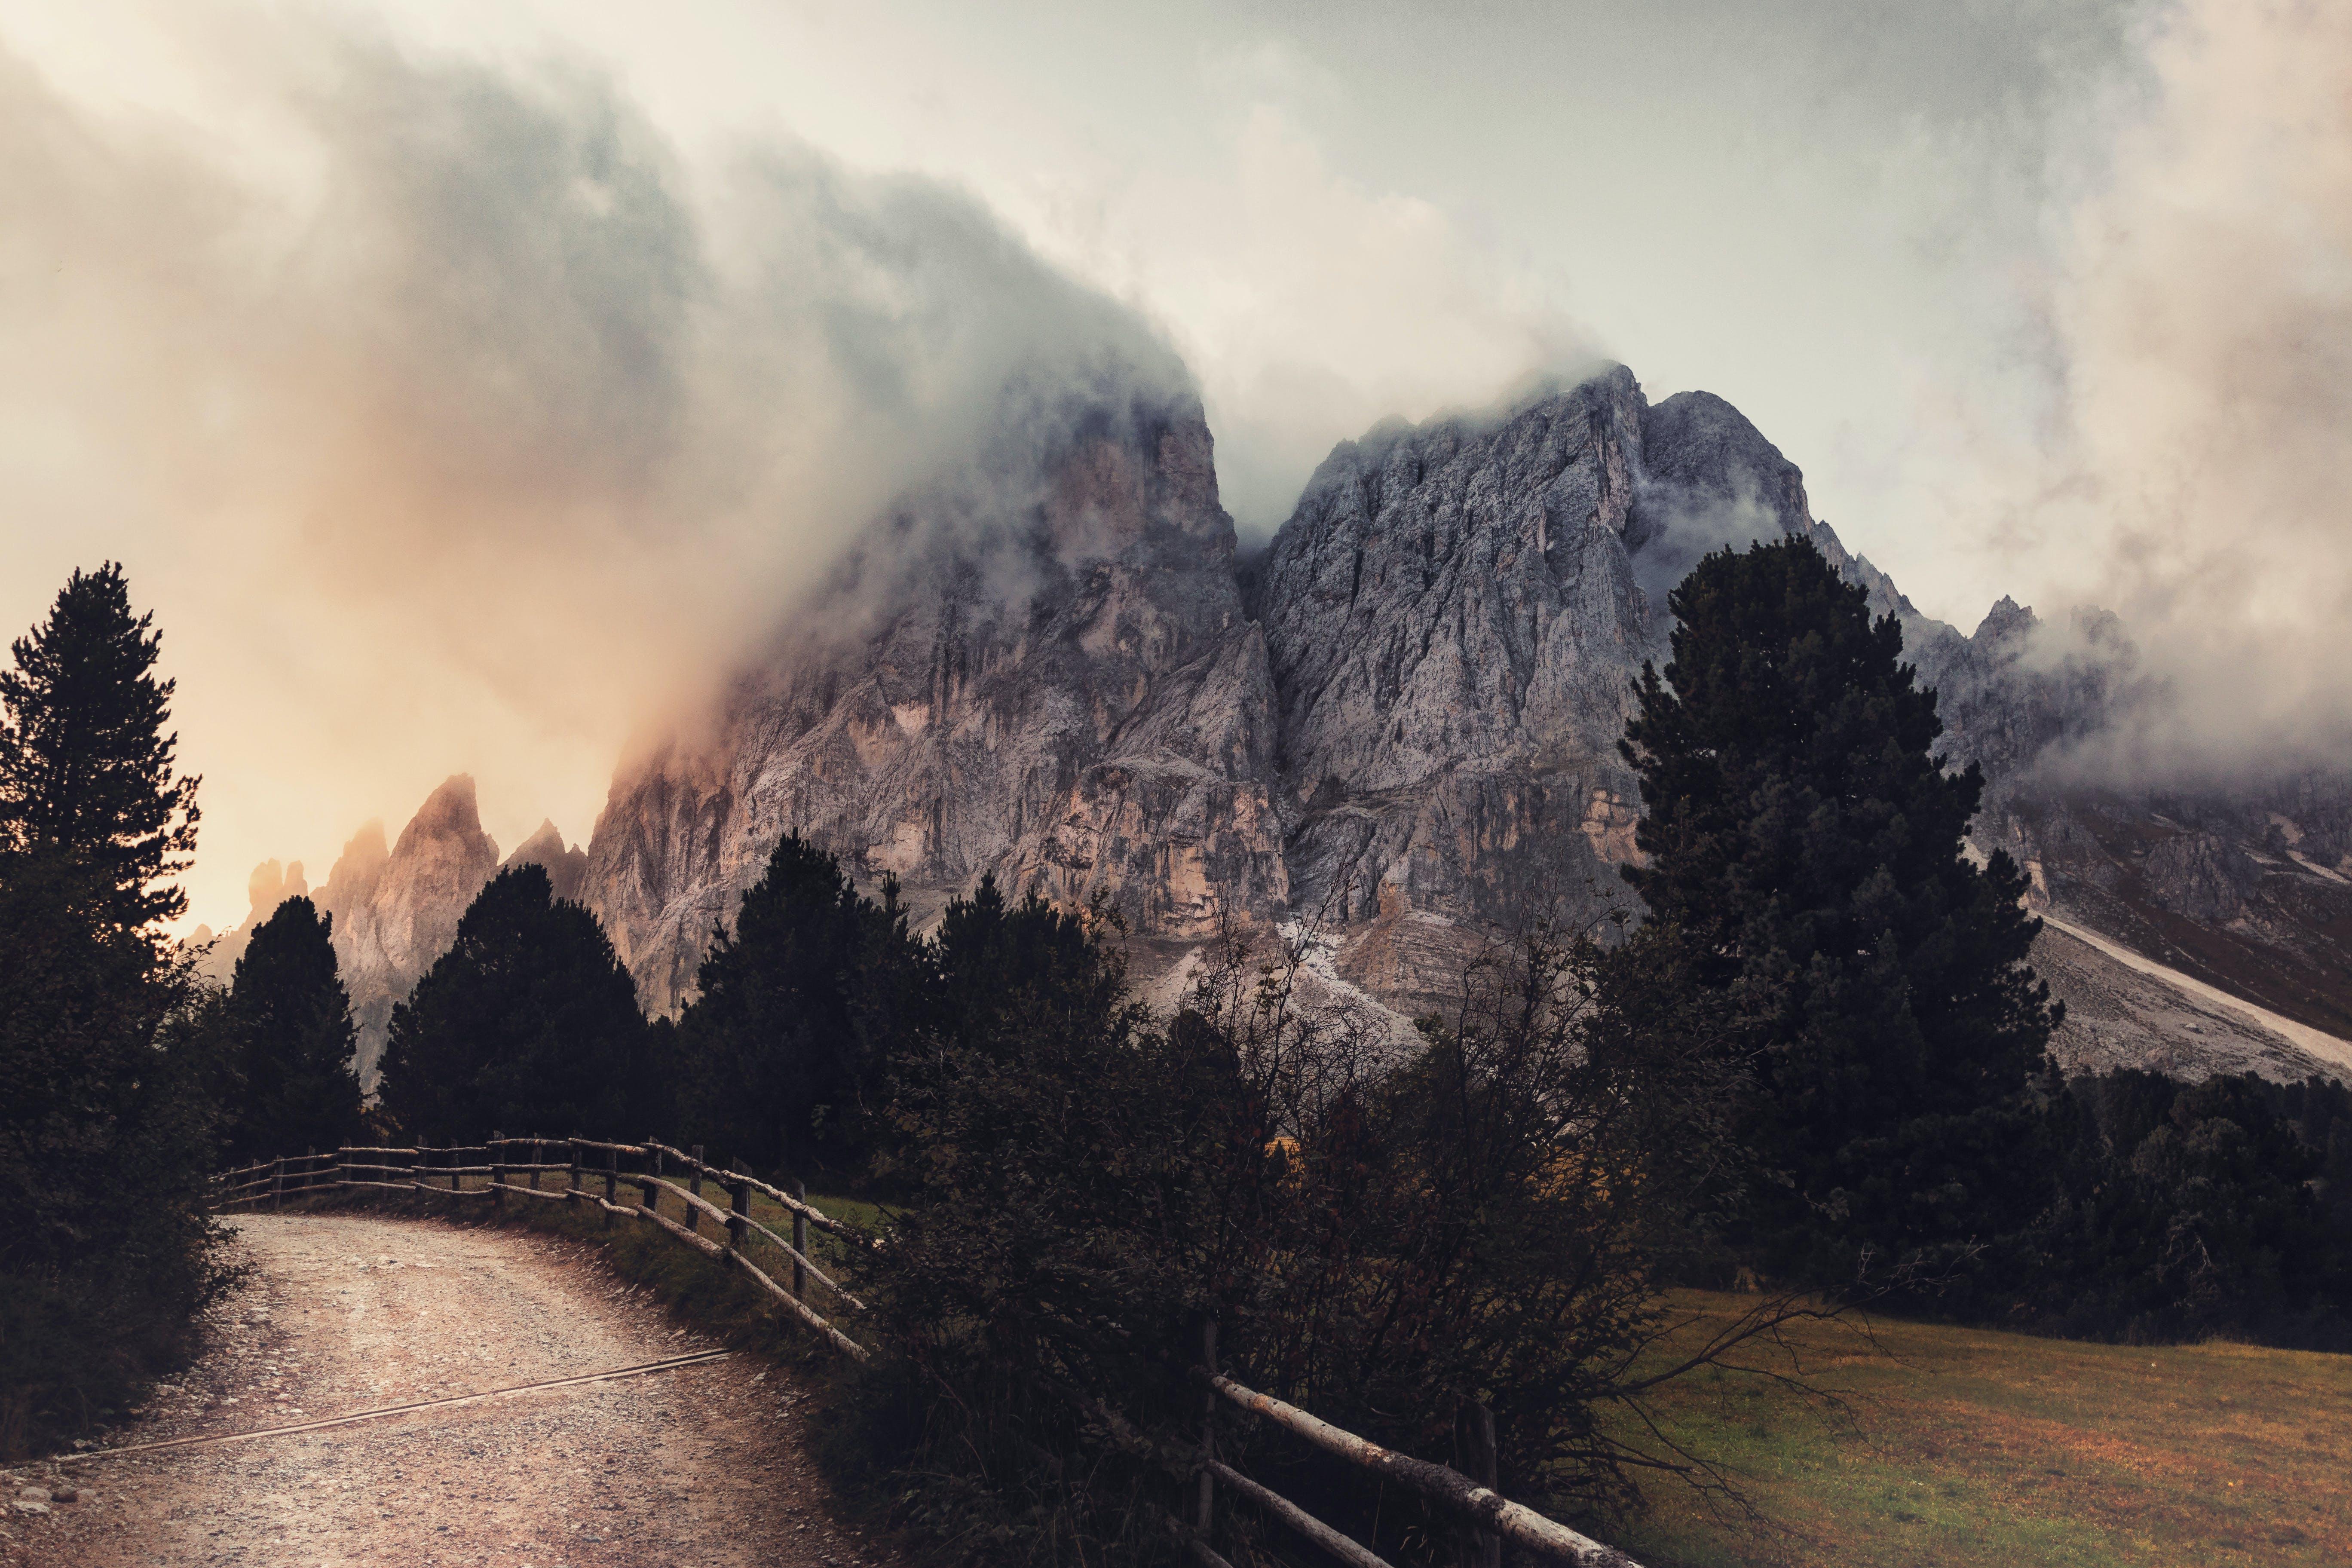 Kostenloses Stock Foto zu bäume, berge, dunstig, fahrbahn